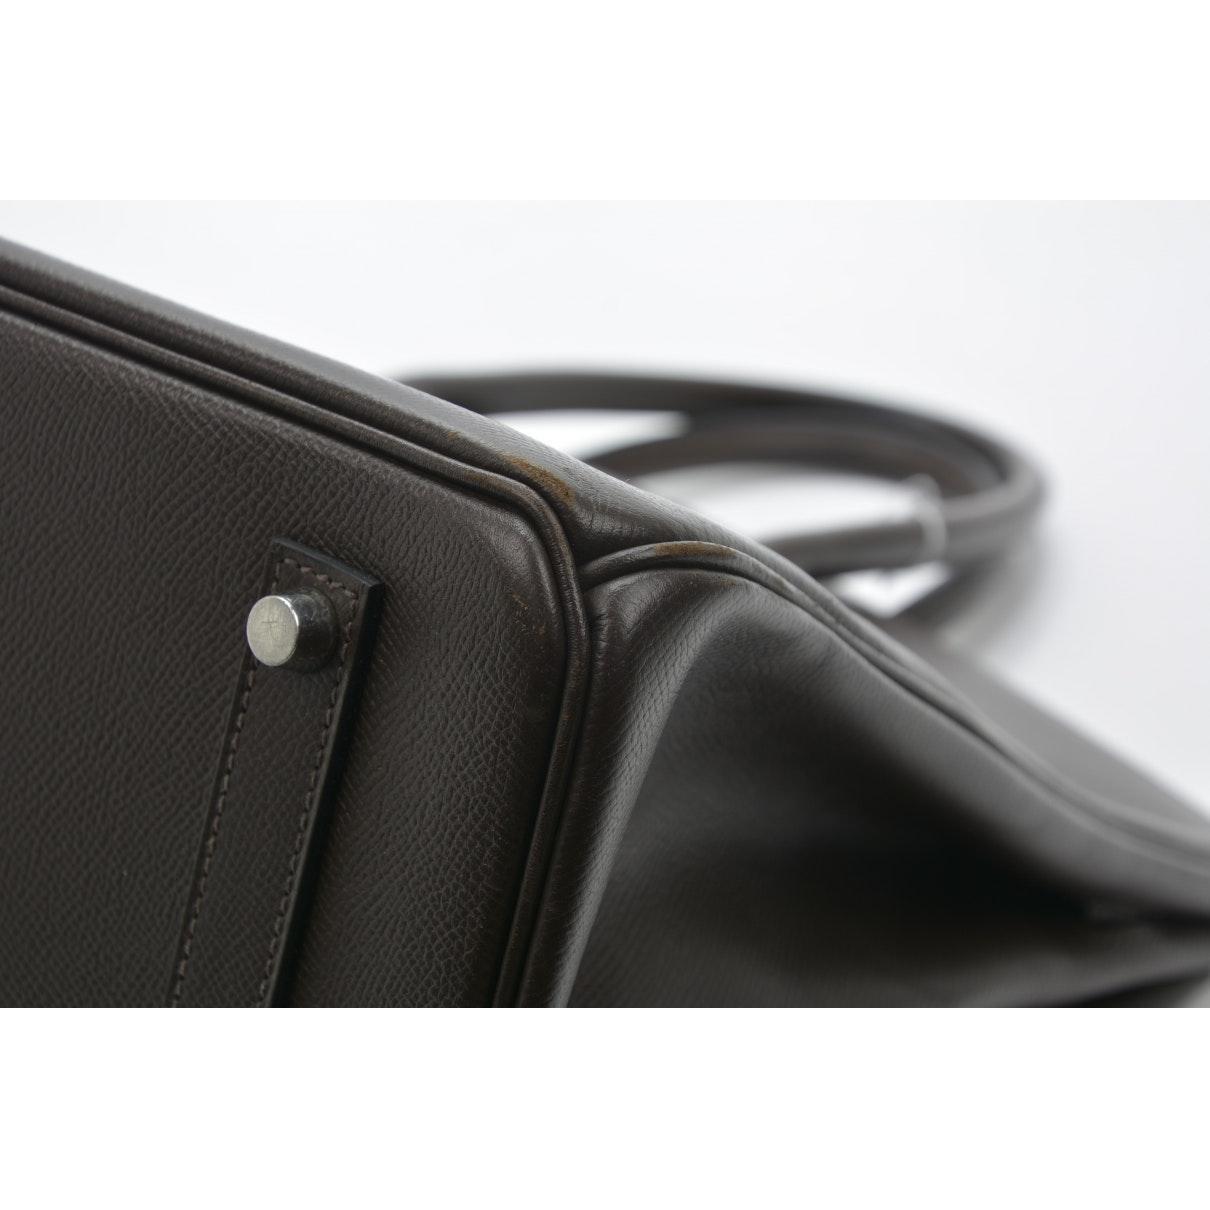 Sac à main Birkin 35 en Cuir Marron Hermès en coloris Noir QEh7